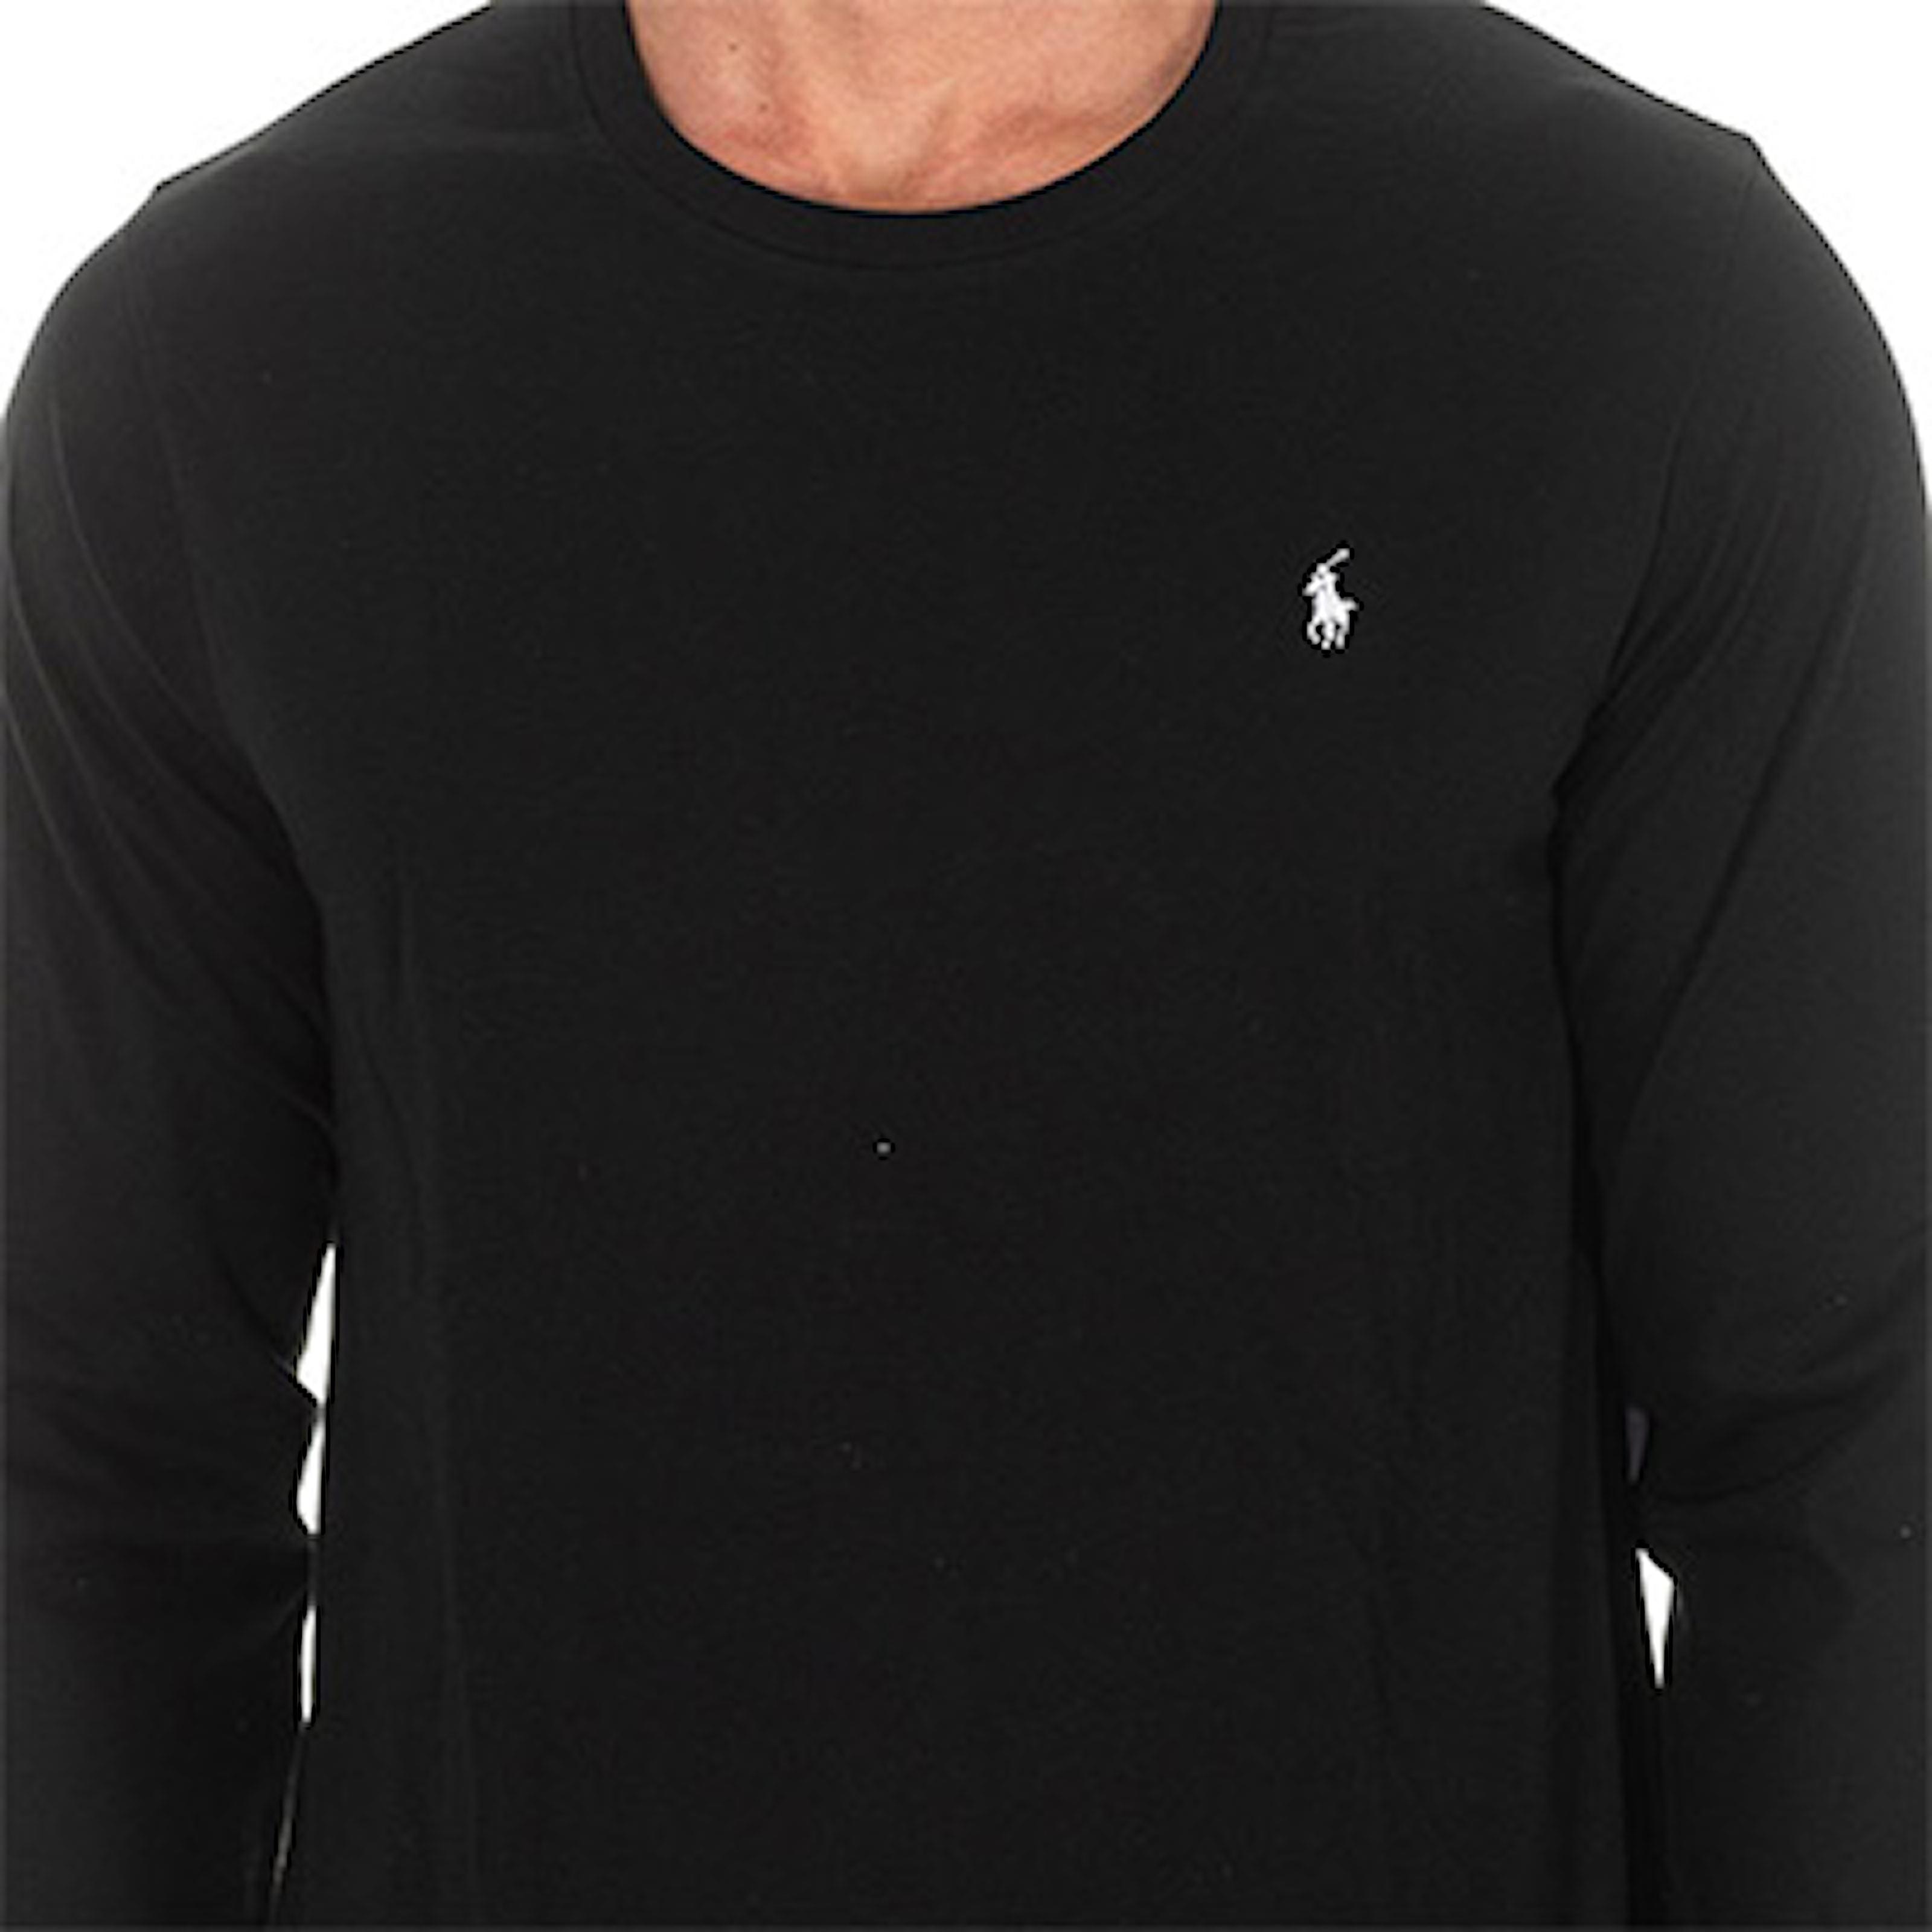 Svart, L, Long Sleeve Ralph Lauren, Långärmad tröja från Ralph Lauren, ,